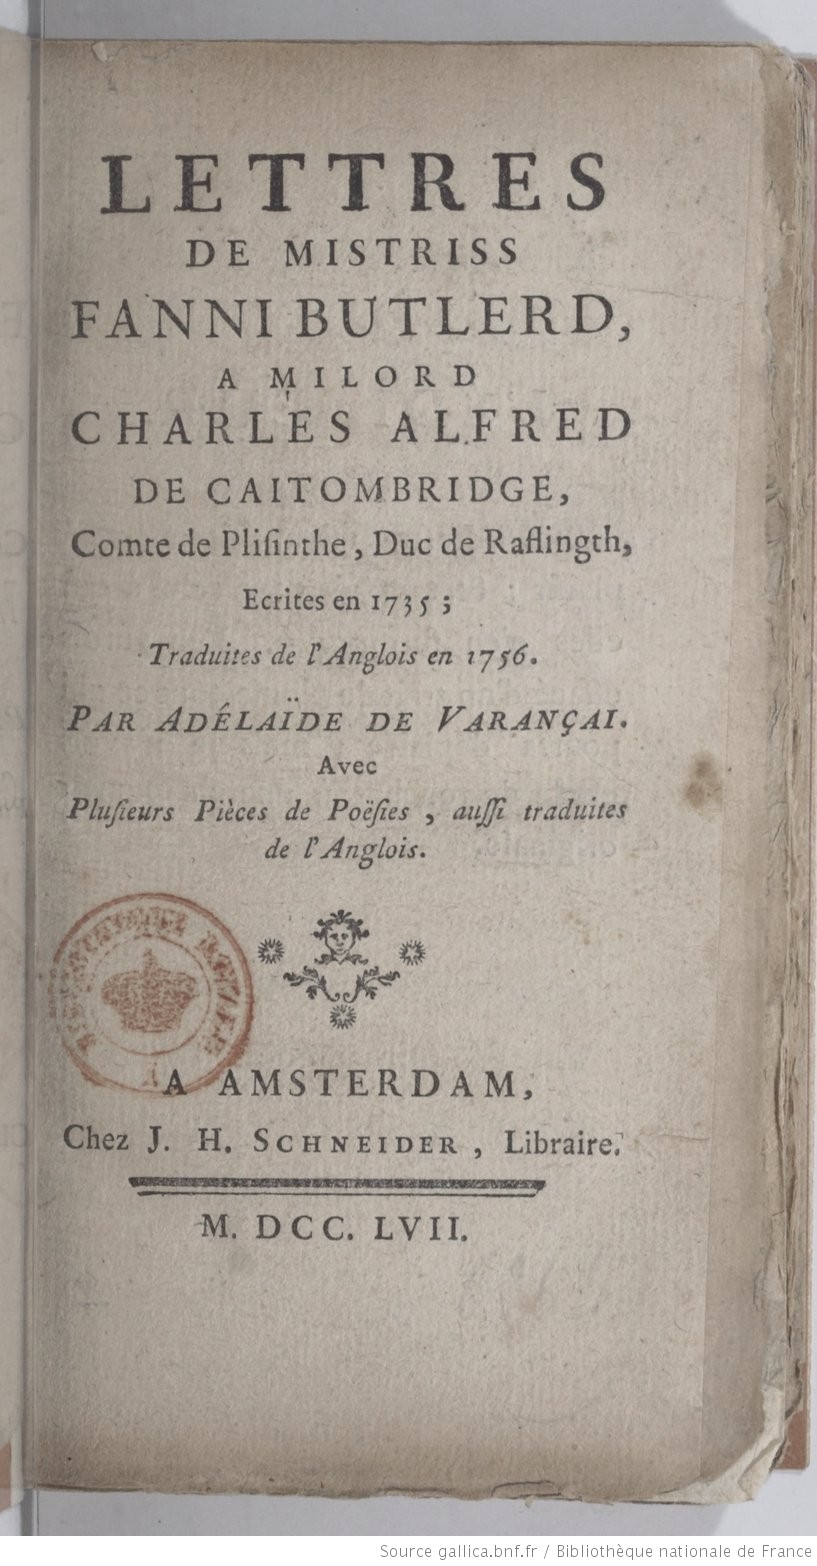 Lettres de Fanny Butlerd (French Edition)